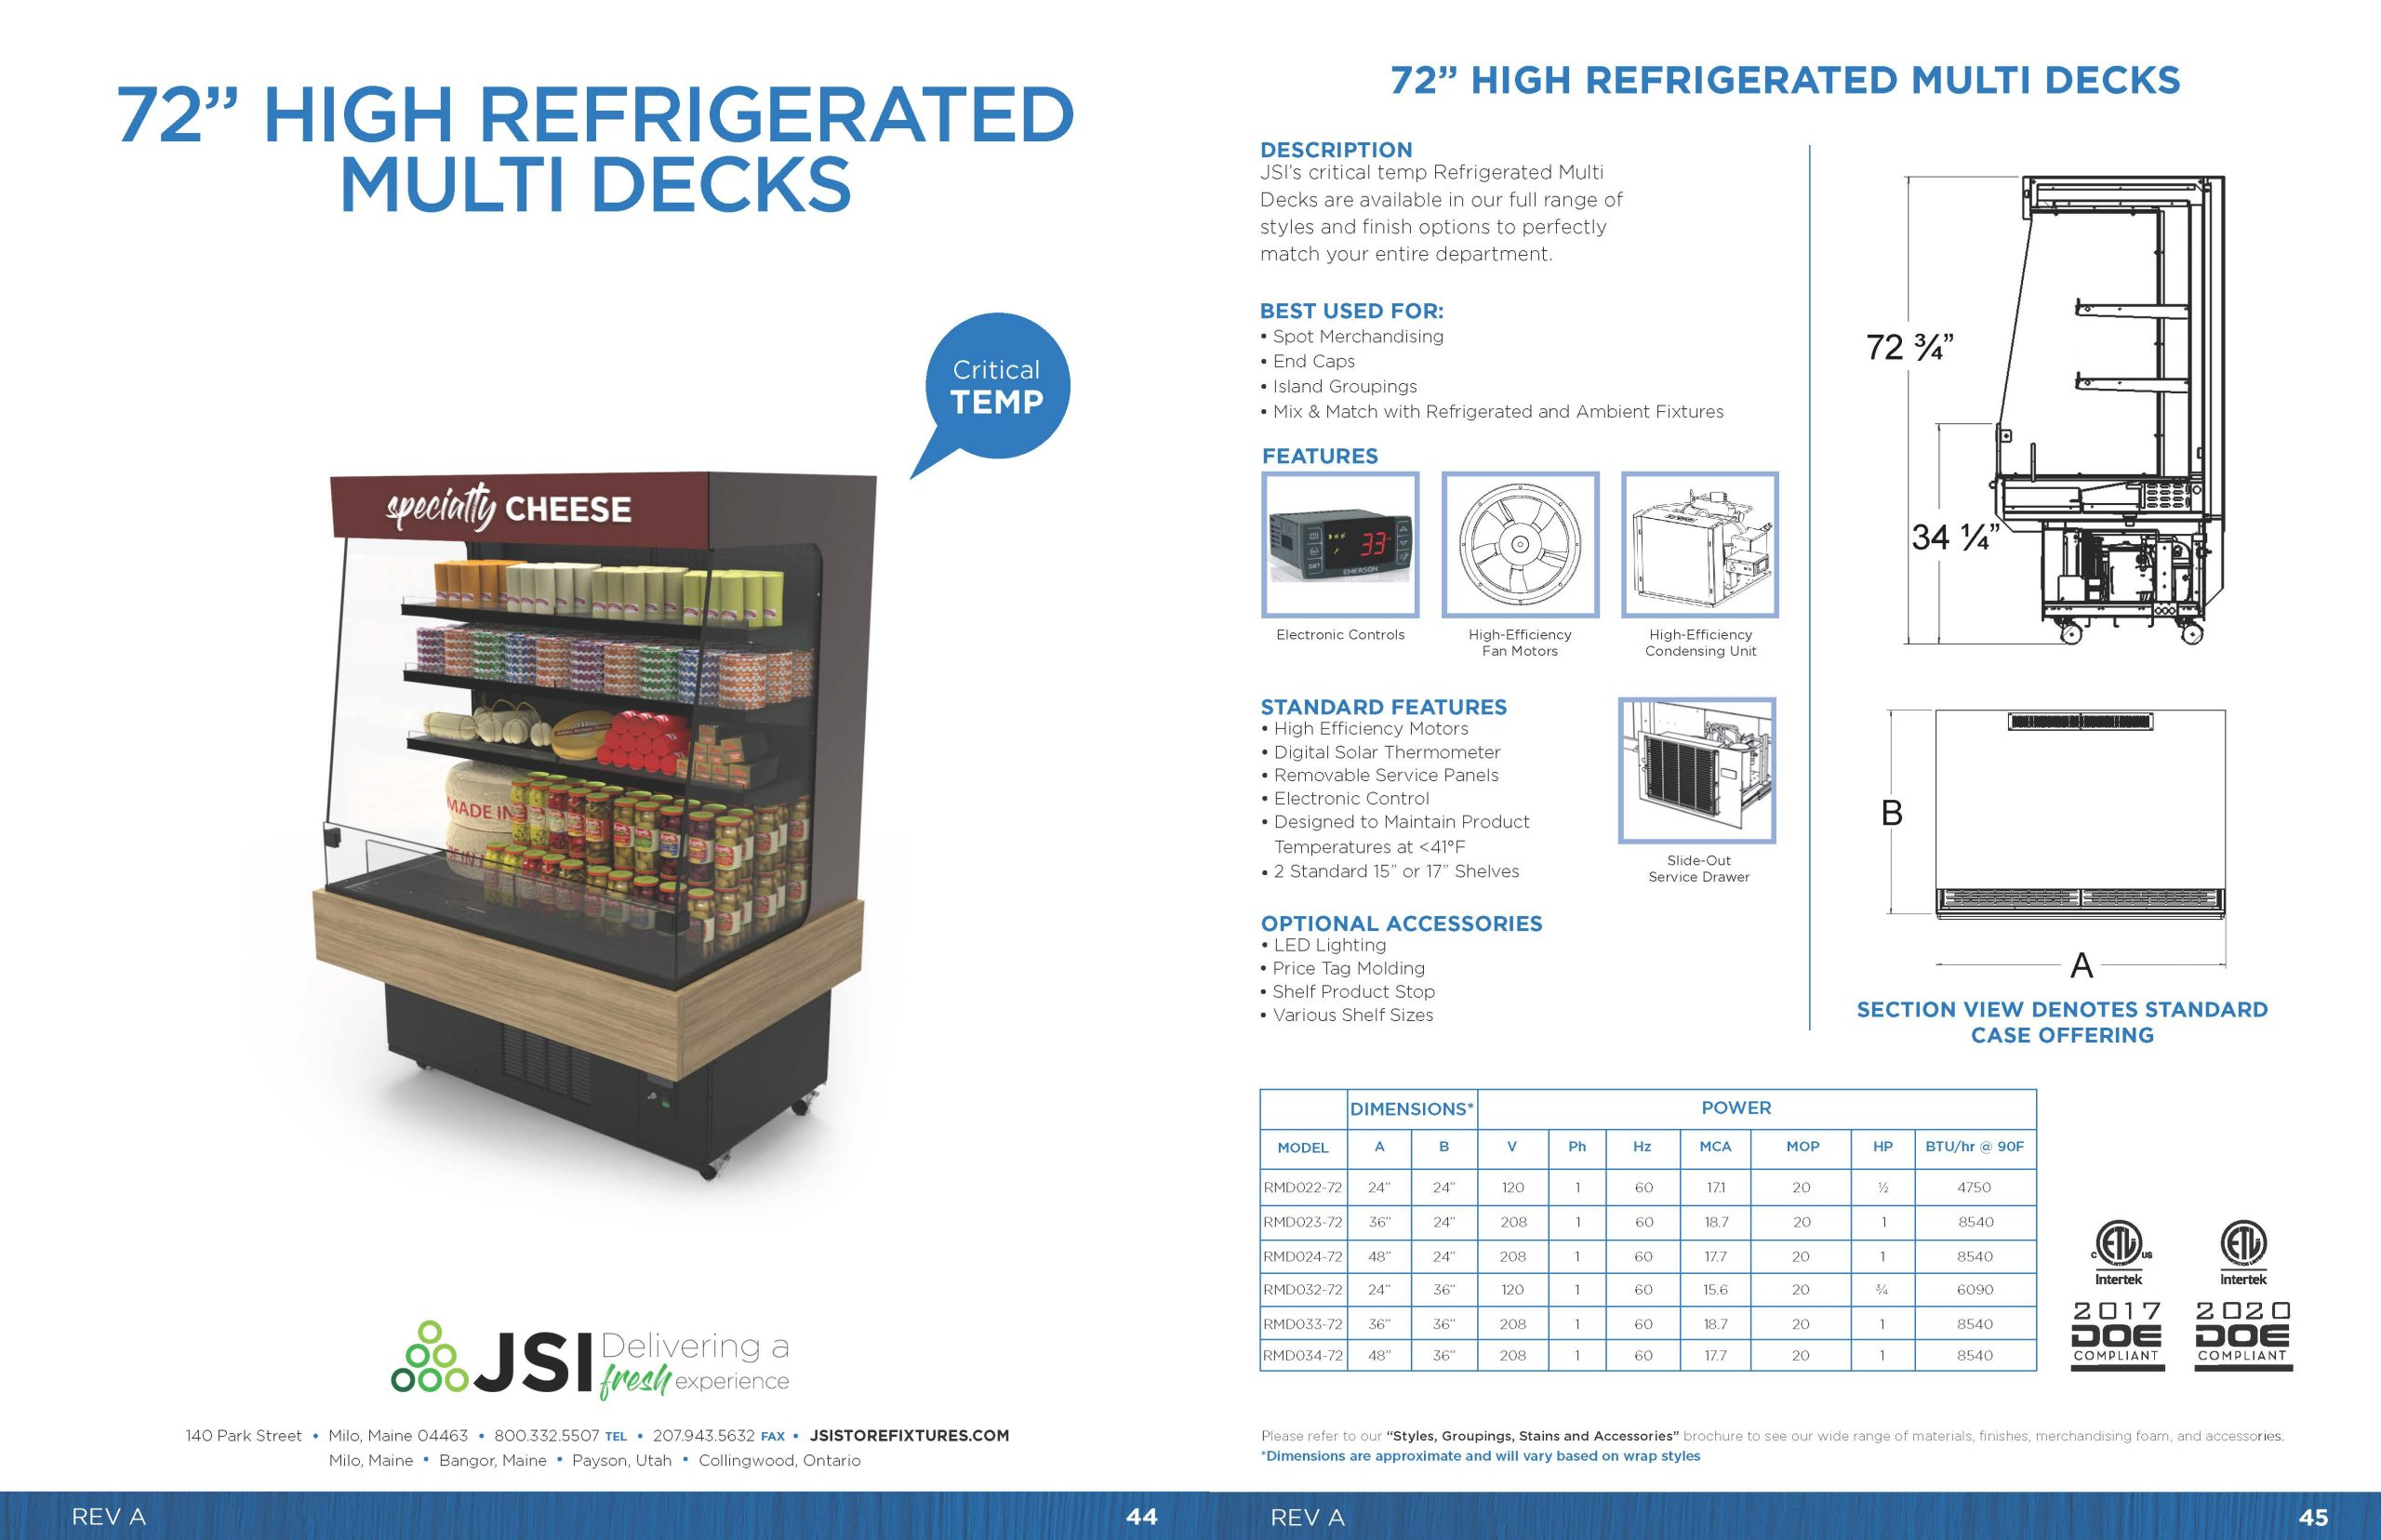 72in High Refrigerated Multi Decks